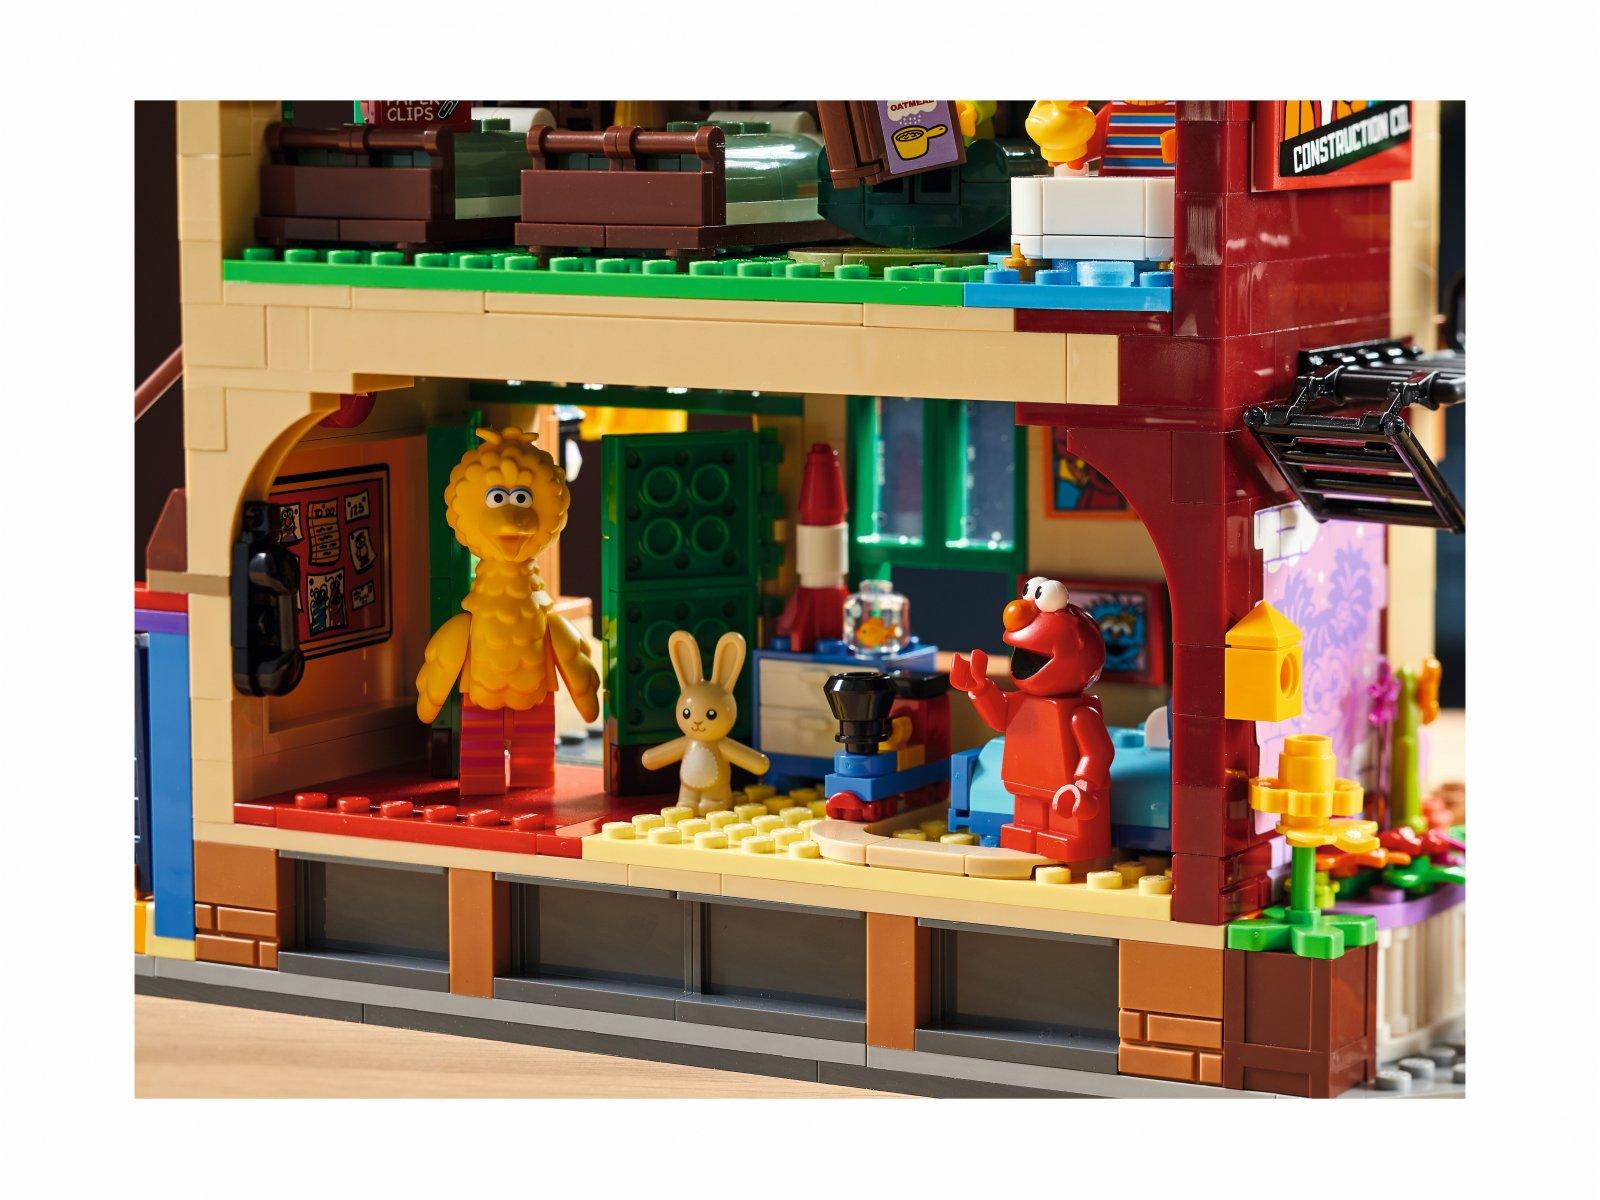 LEGO 21324 Ideas 123 Sesame Street